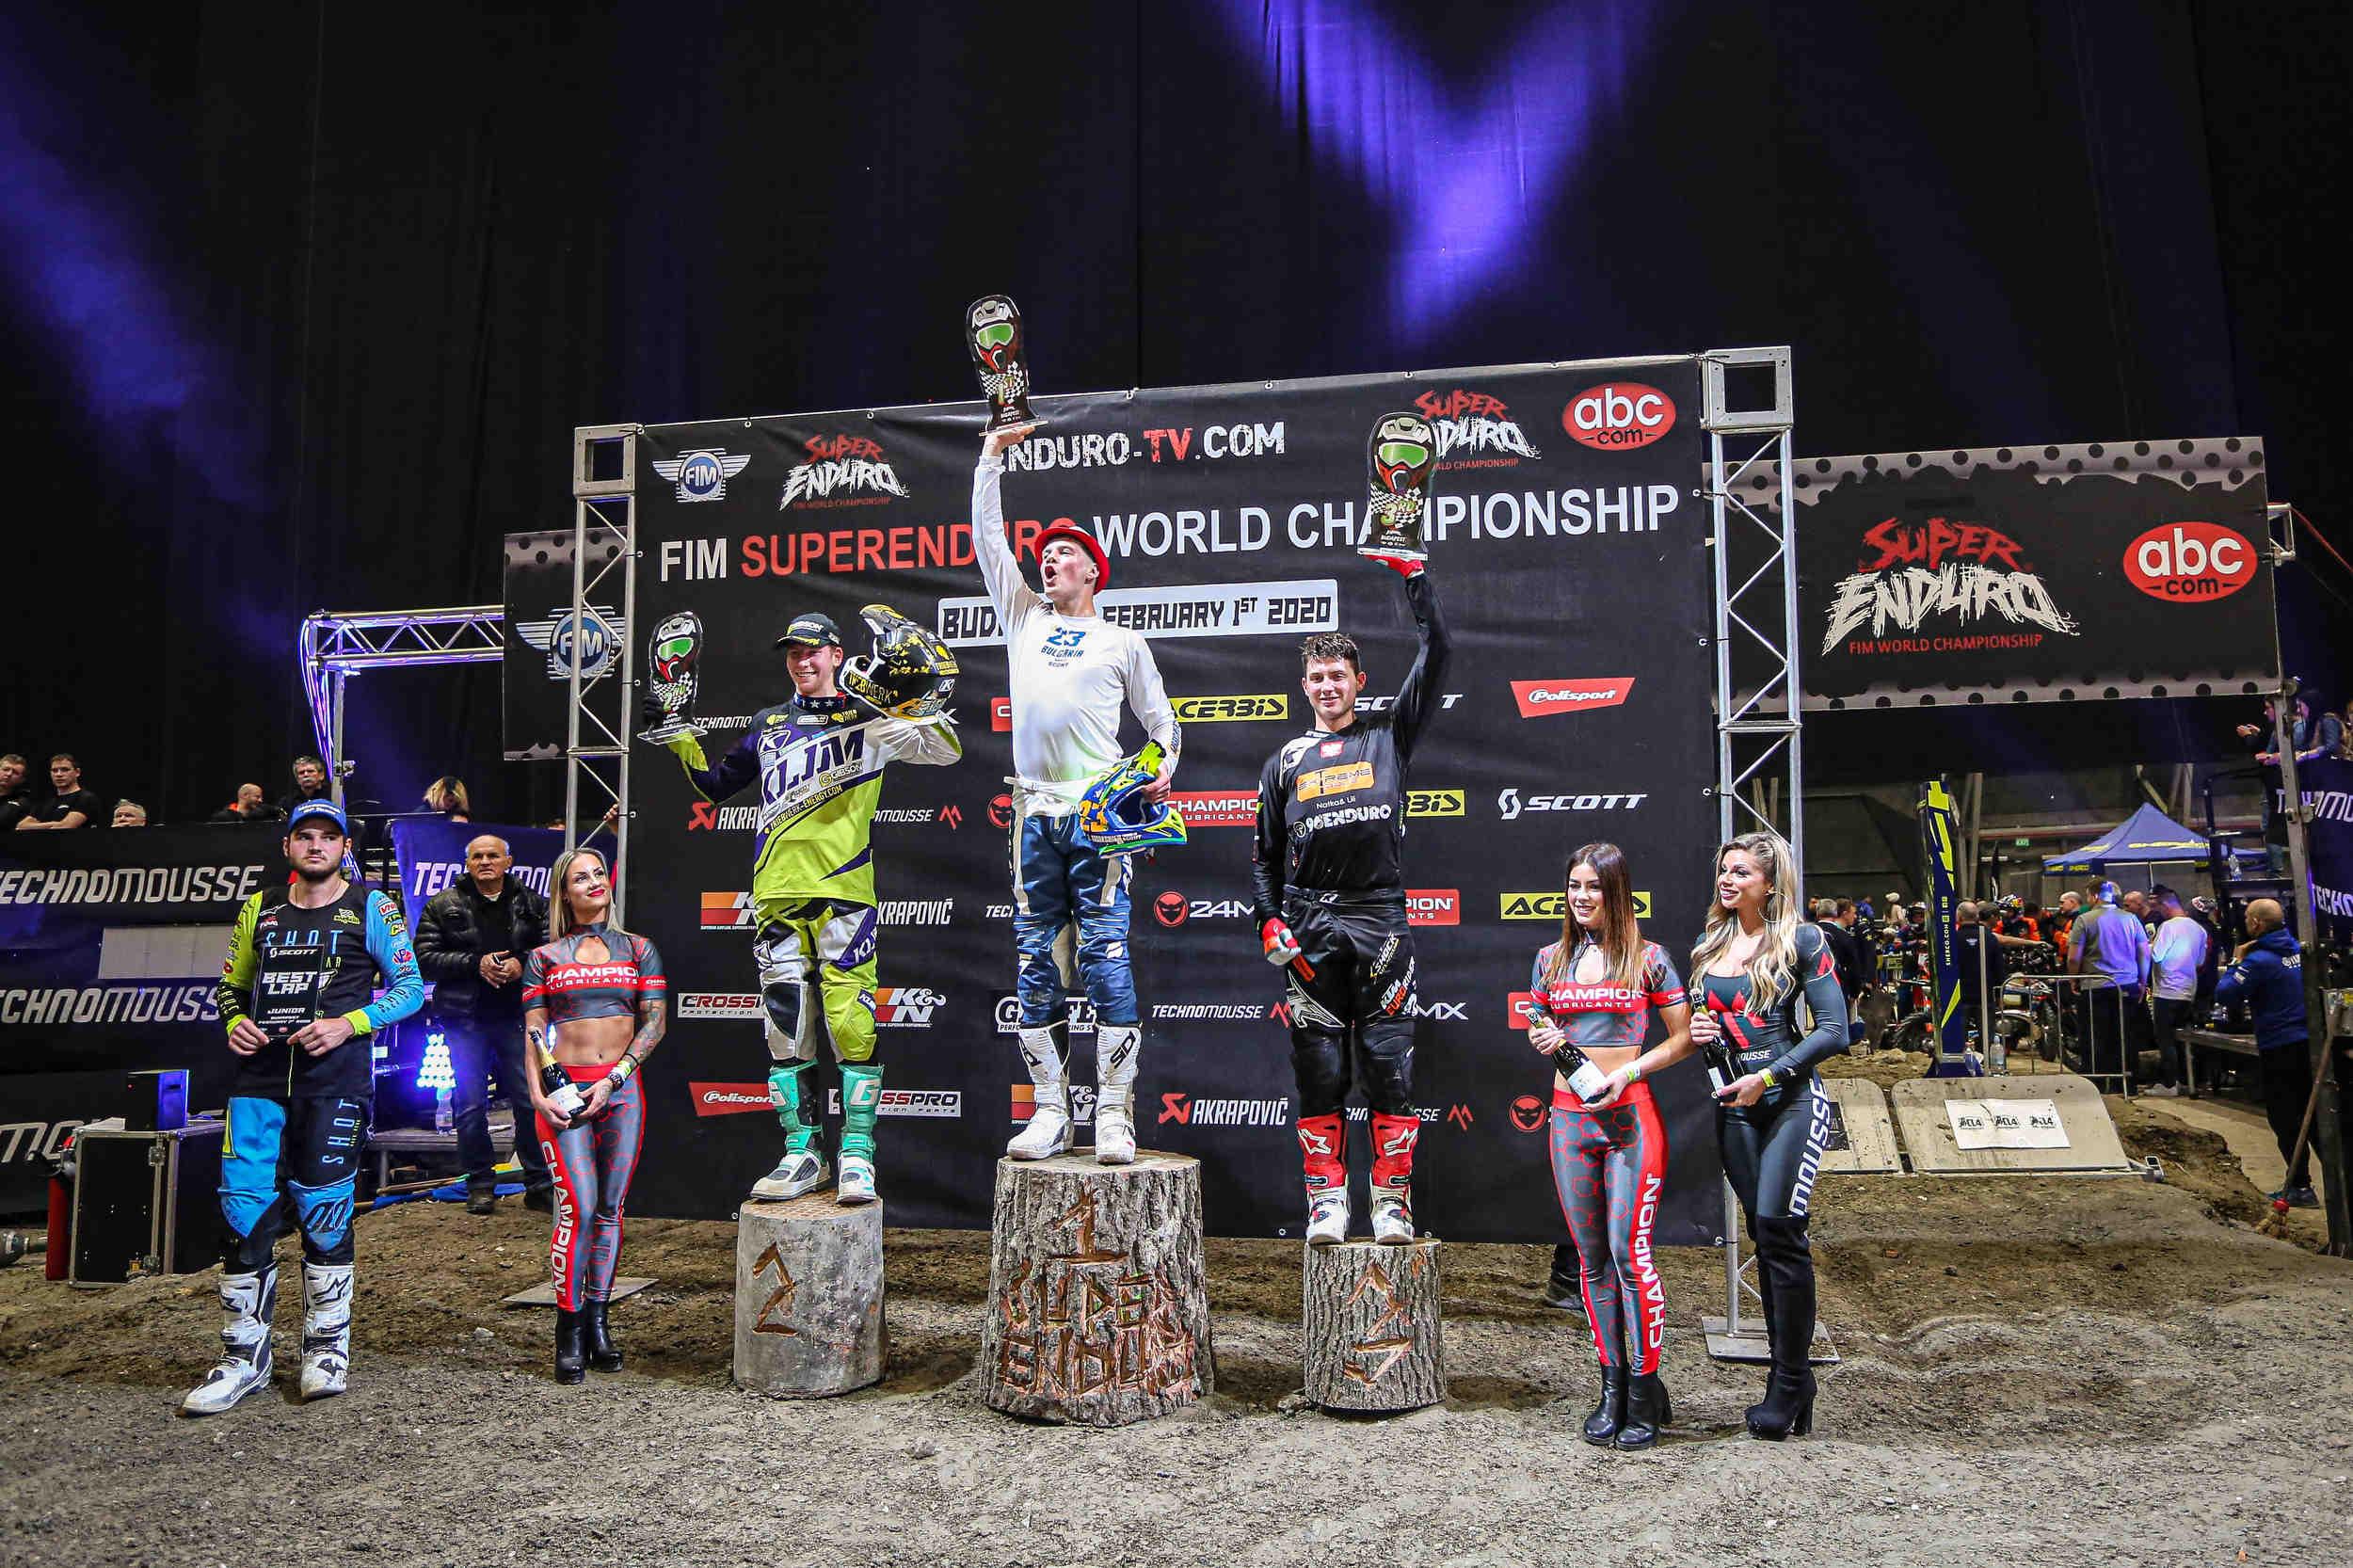 Теодор Кабакчиев с нова победа в Световното супер ендуро